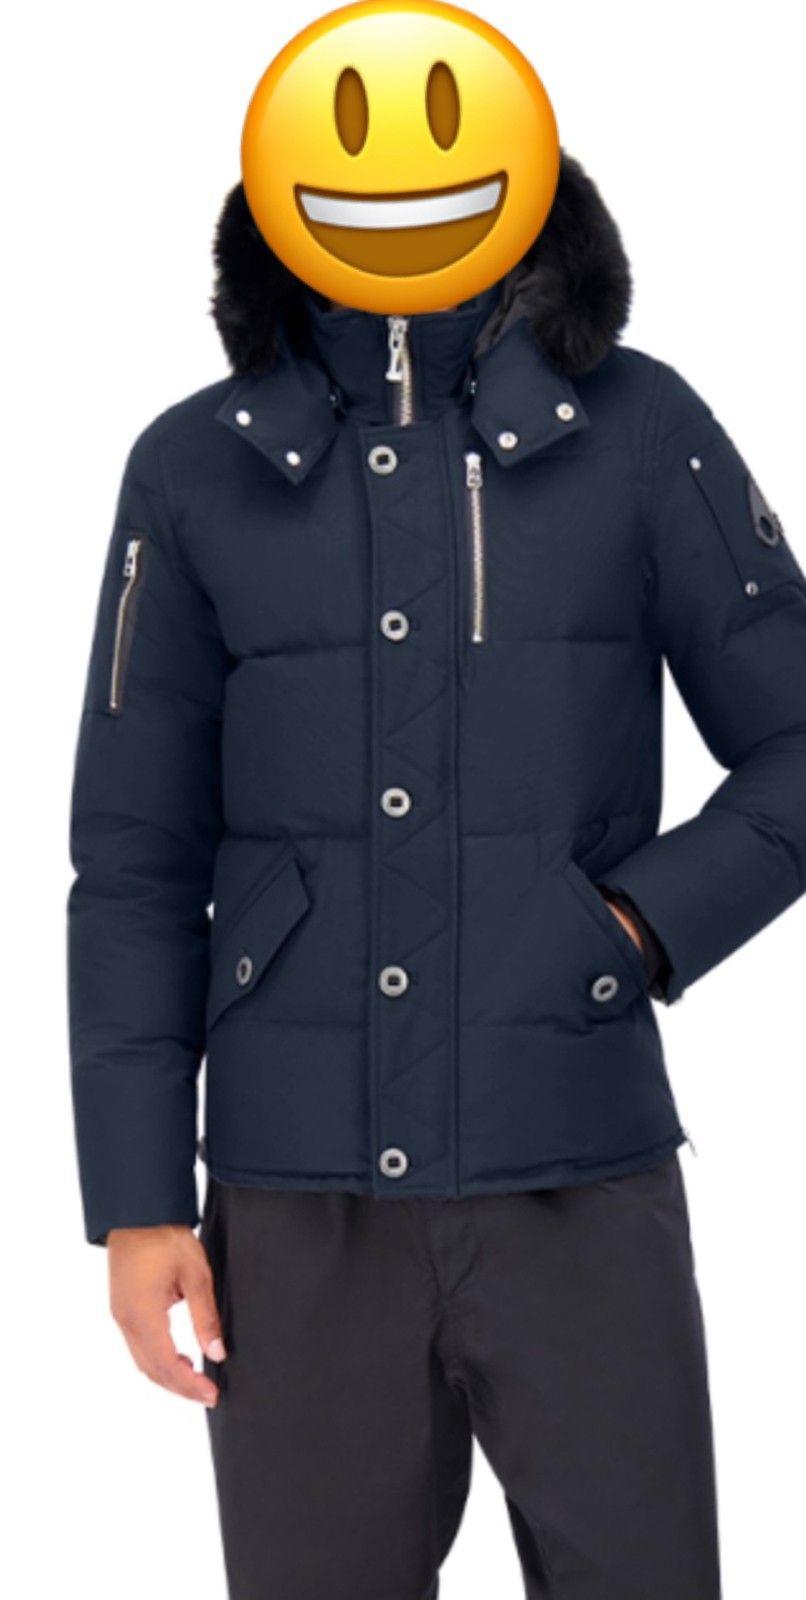 3Q Jacket Oliven   Follestad